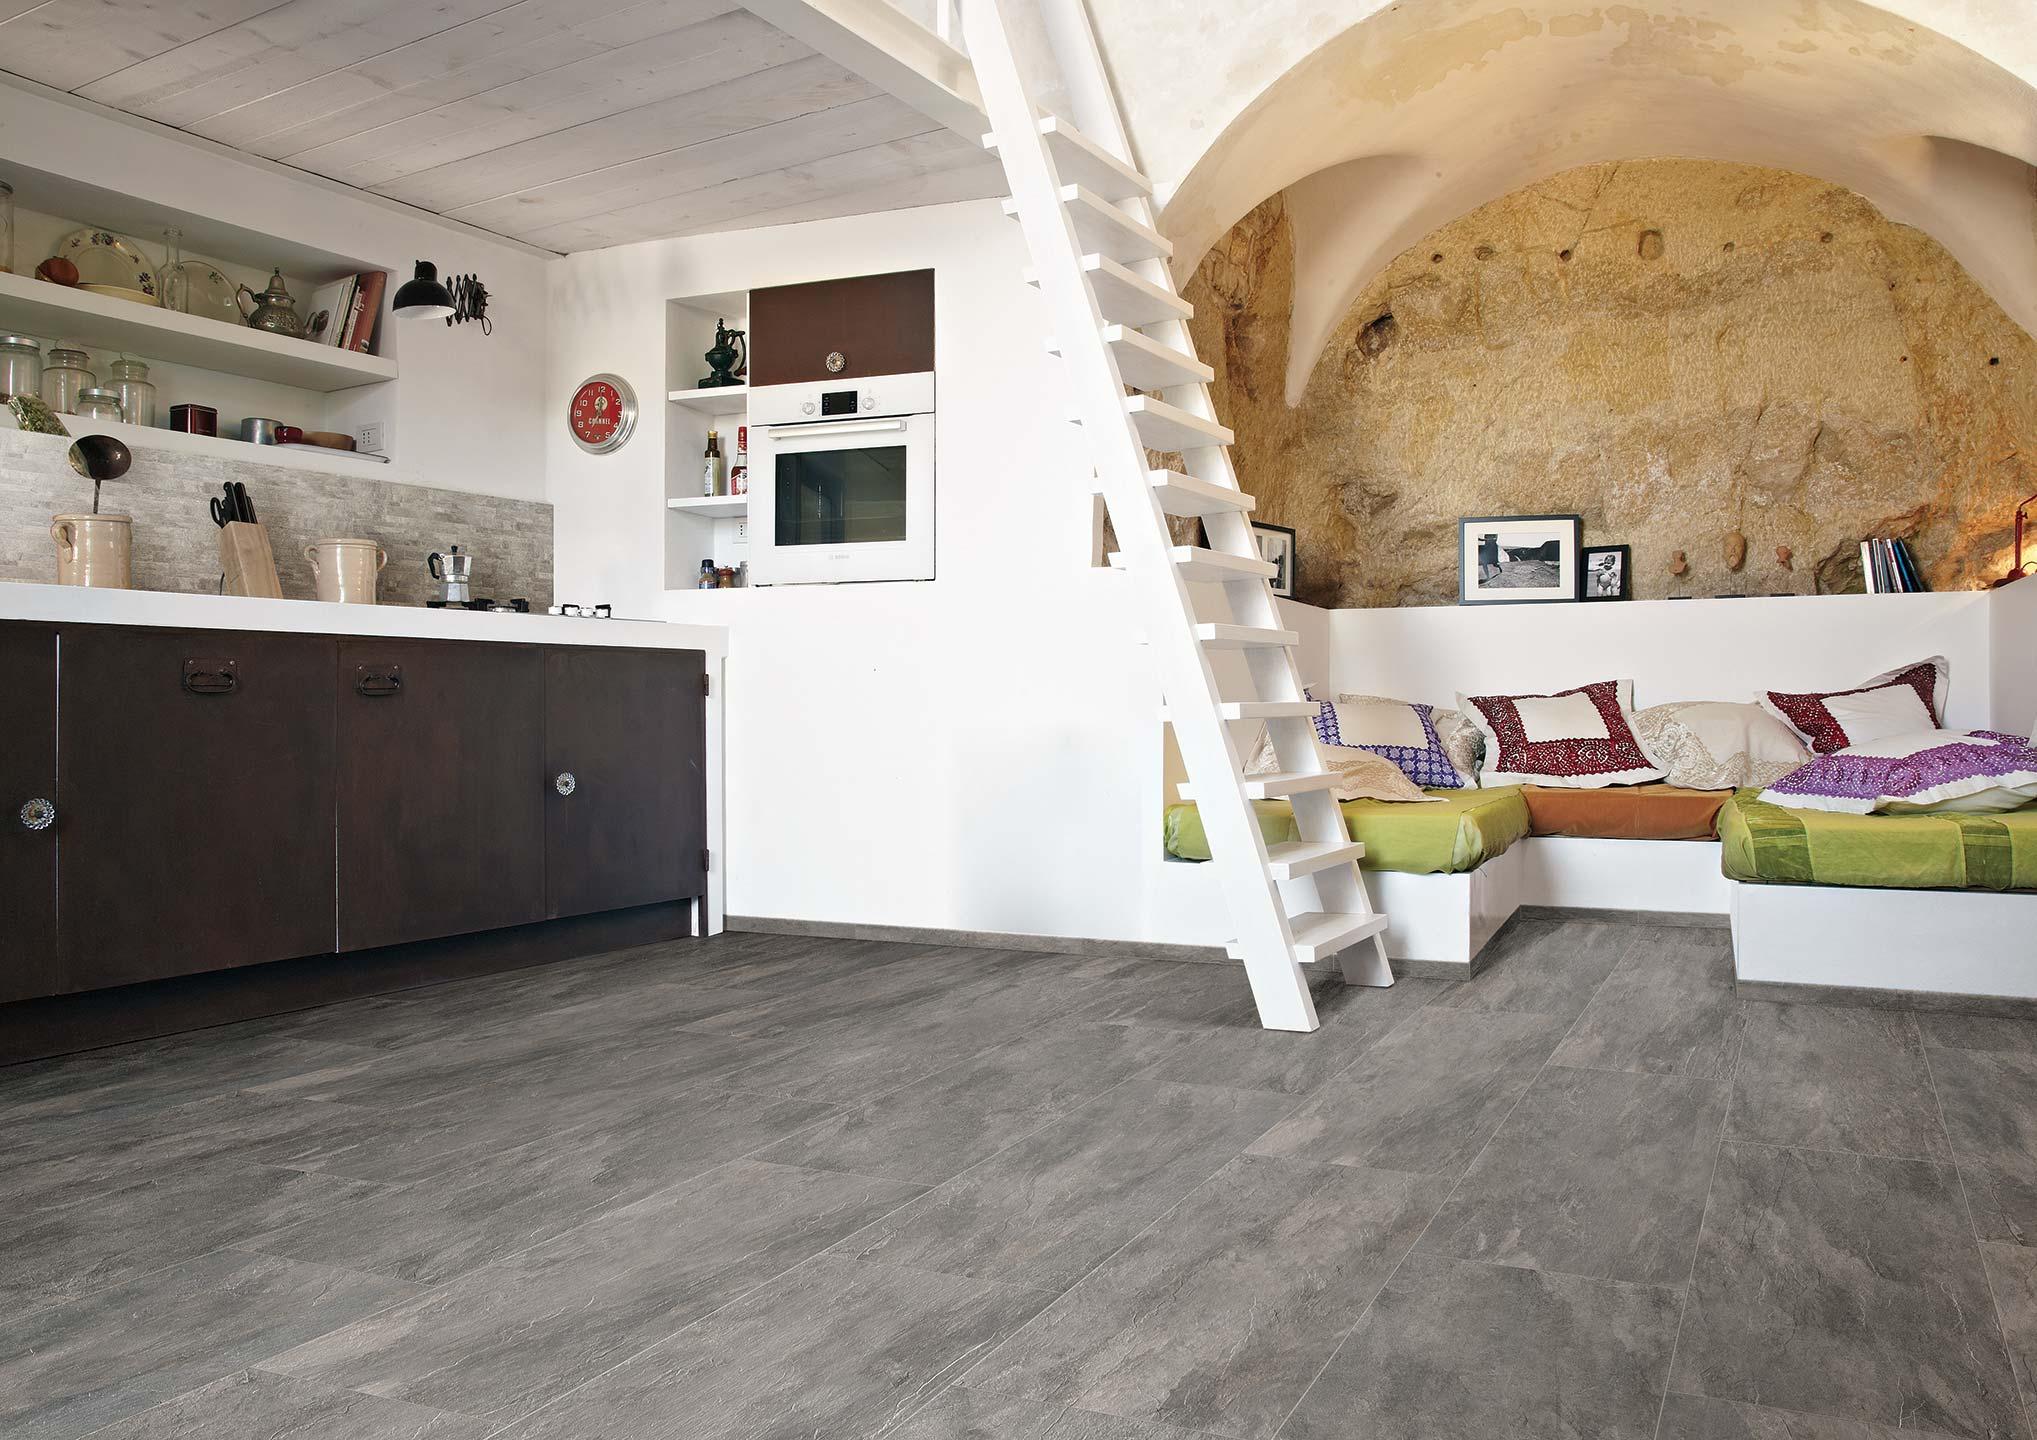 pavimento gres porcel nico gran formato azulejos pe a